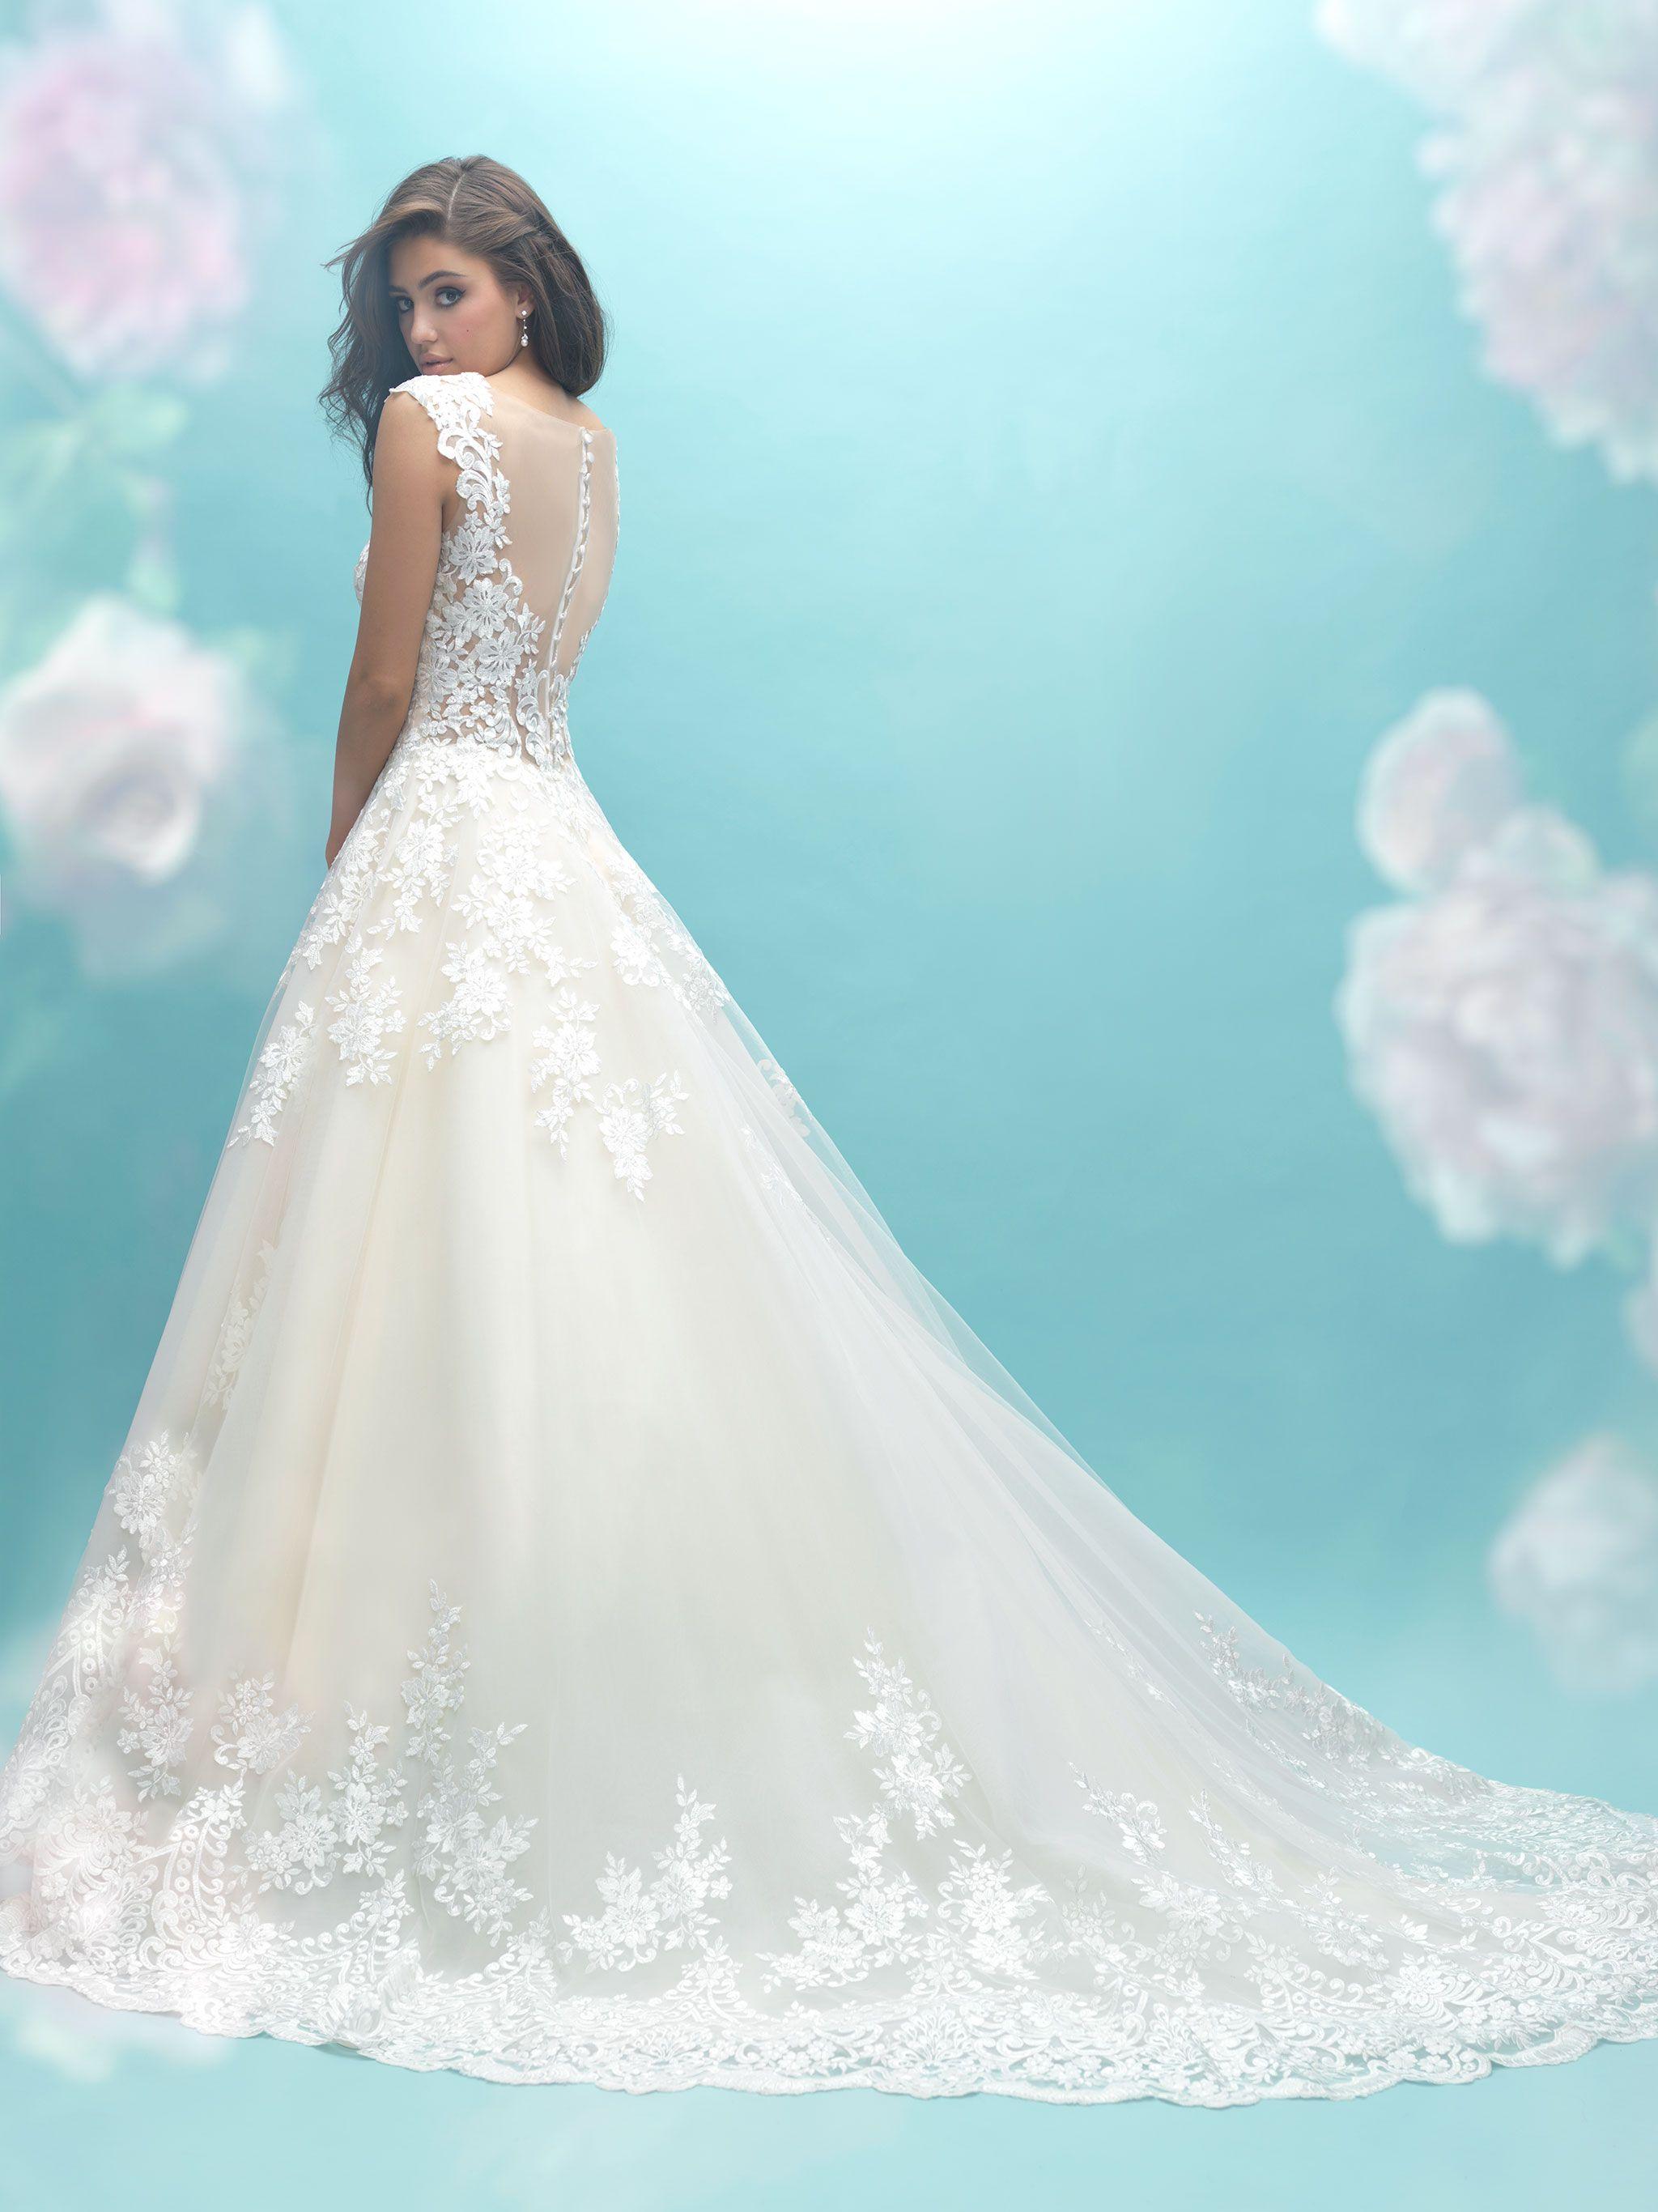 Allure Bridals Dress #9470 | Dream Wedding INDOORS | Pinterest ...